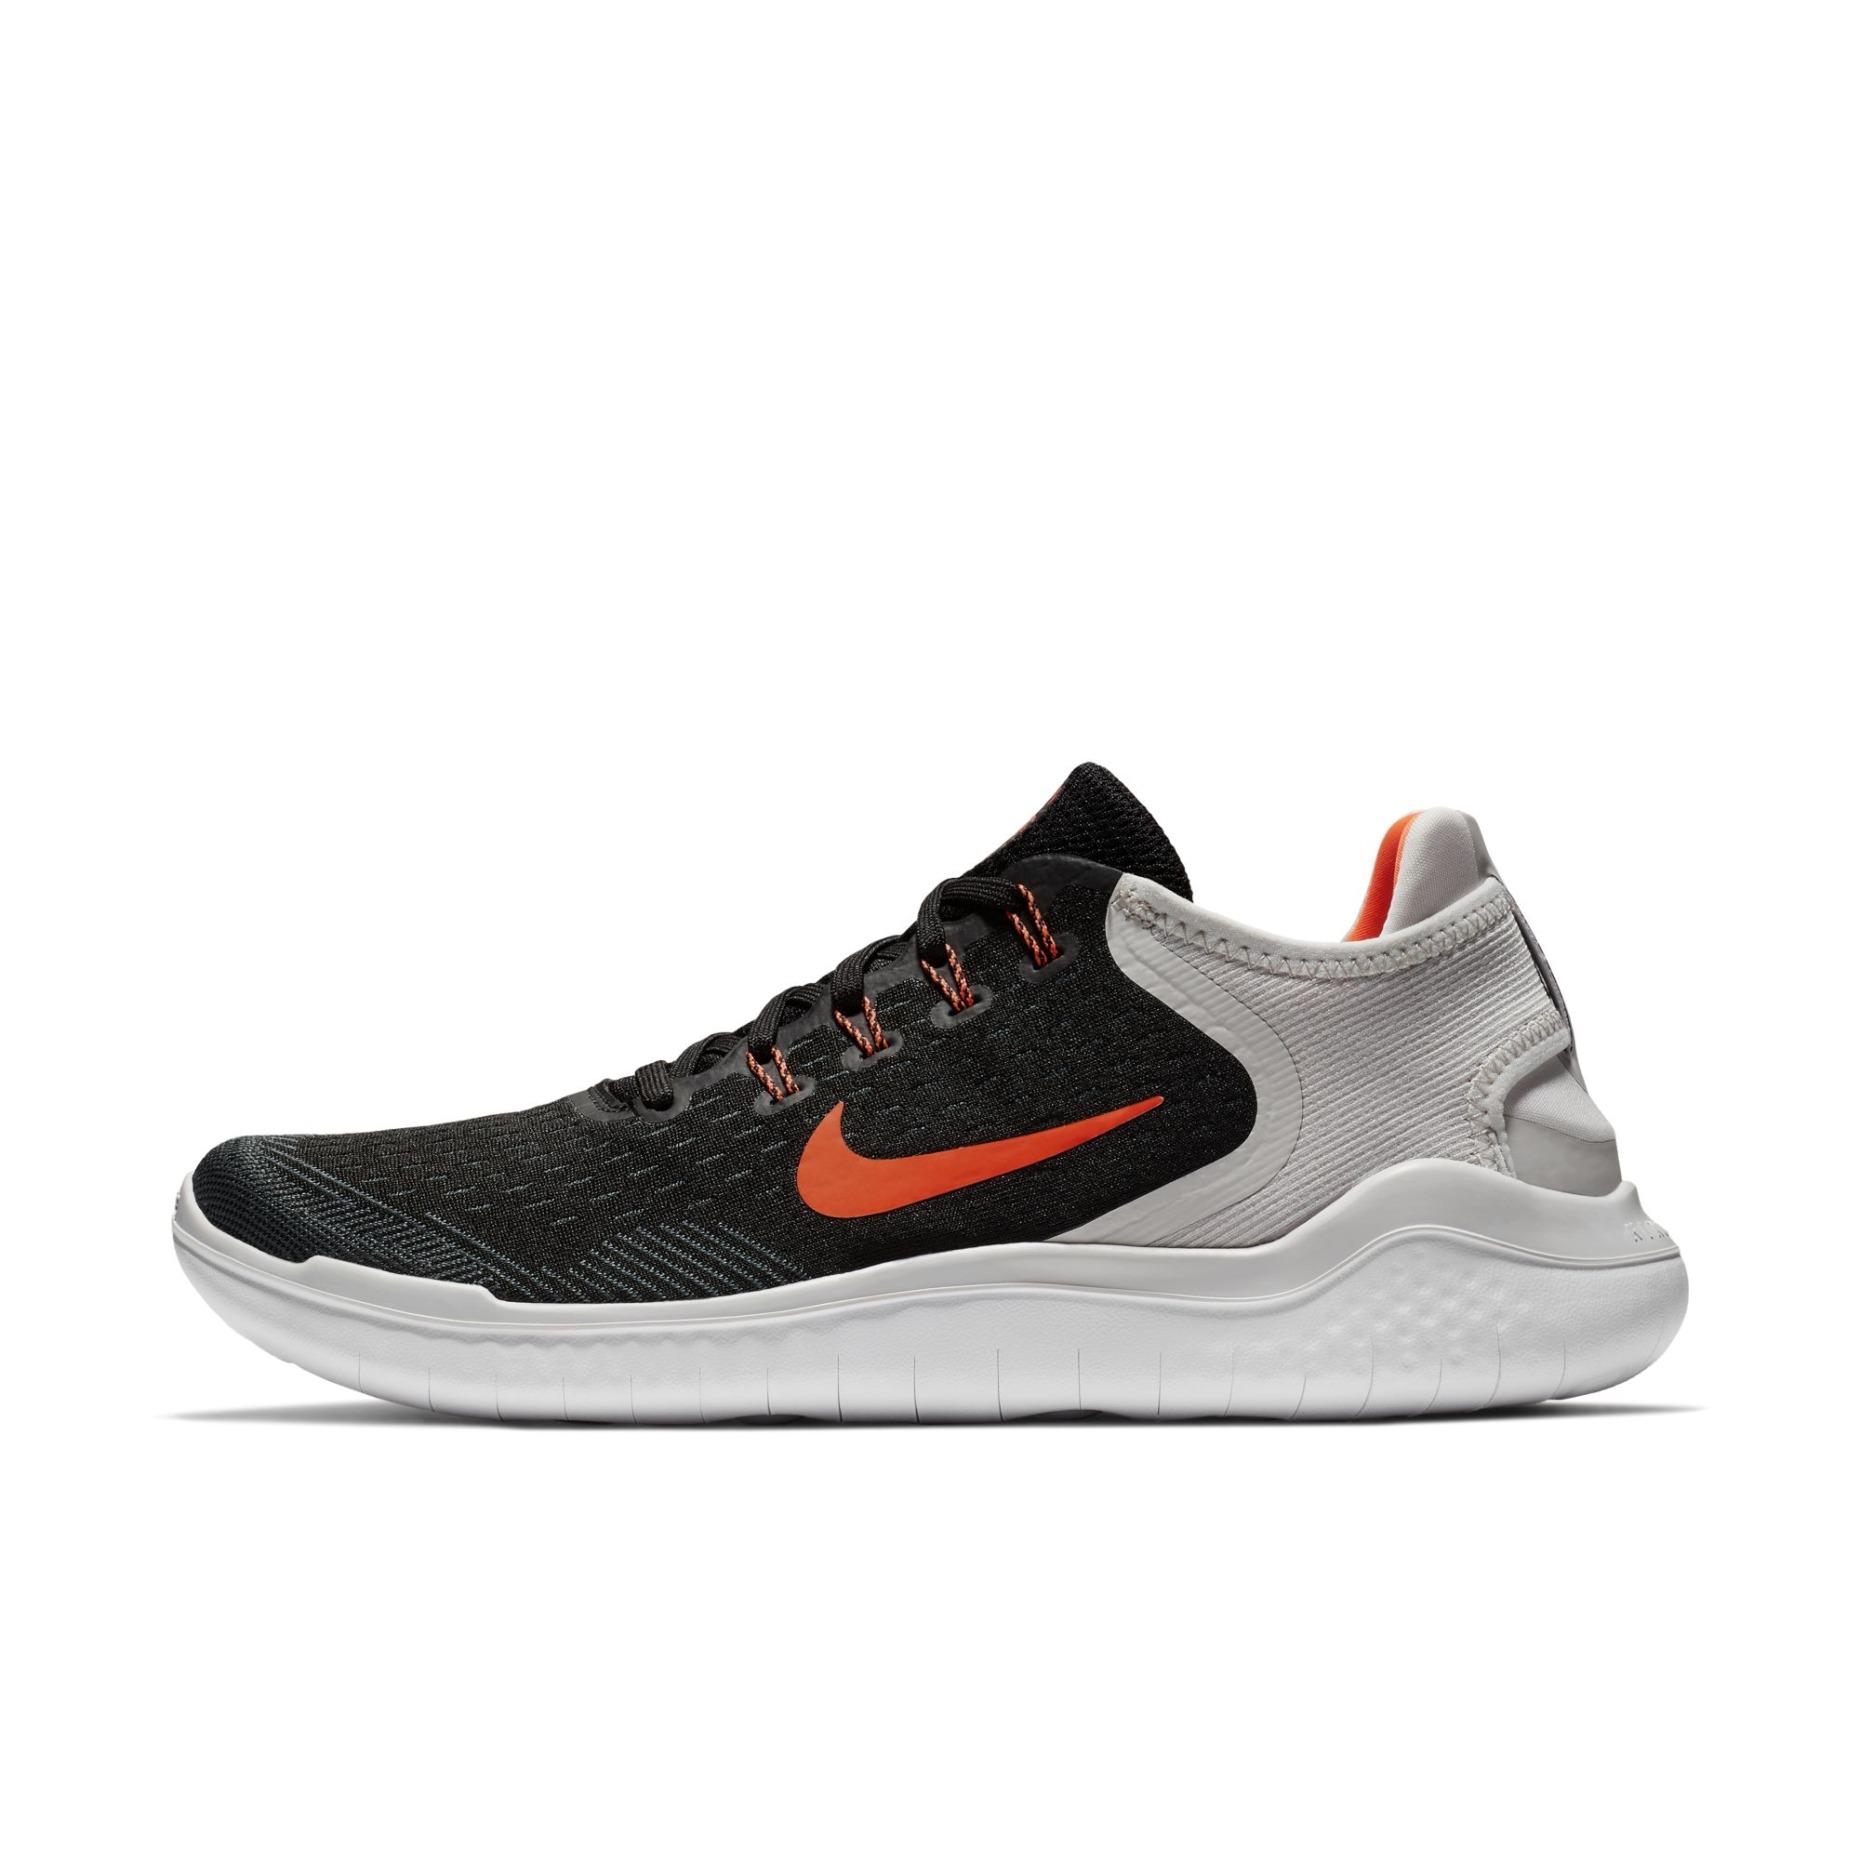 NIKE FREE RUN 2018 (Nike free 2018, Laon) 942,836 010